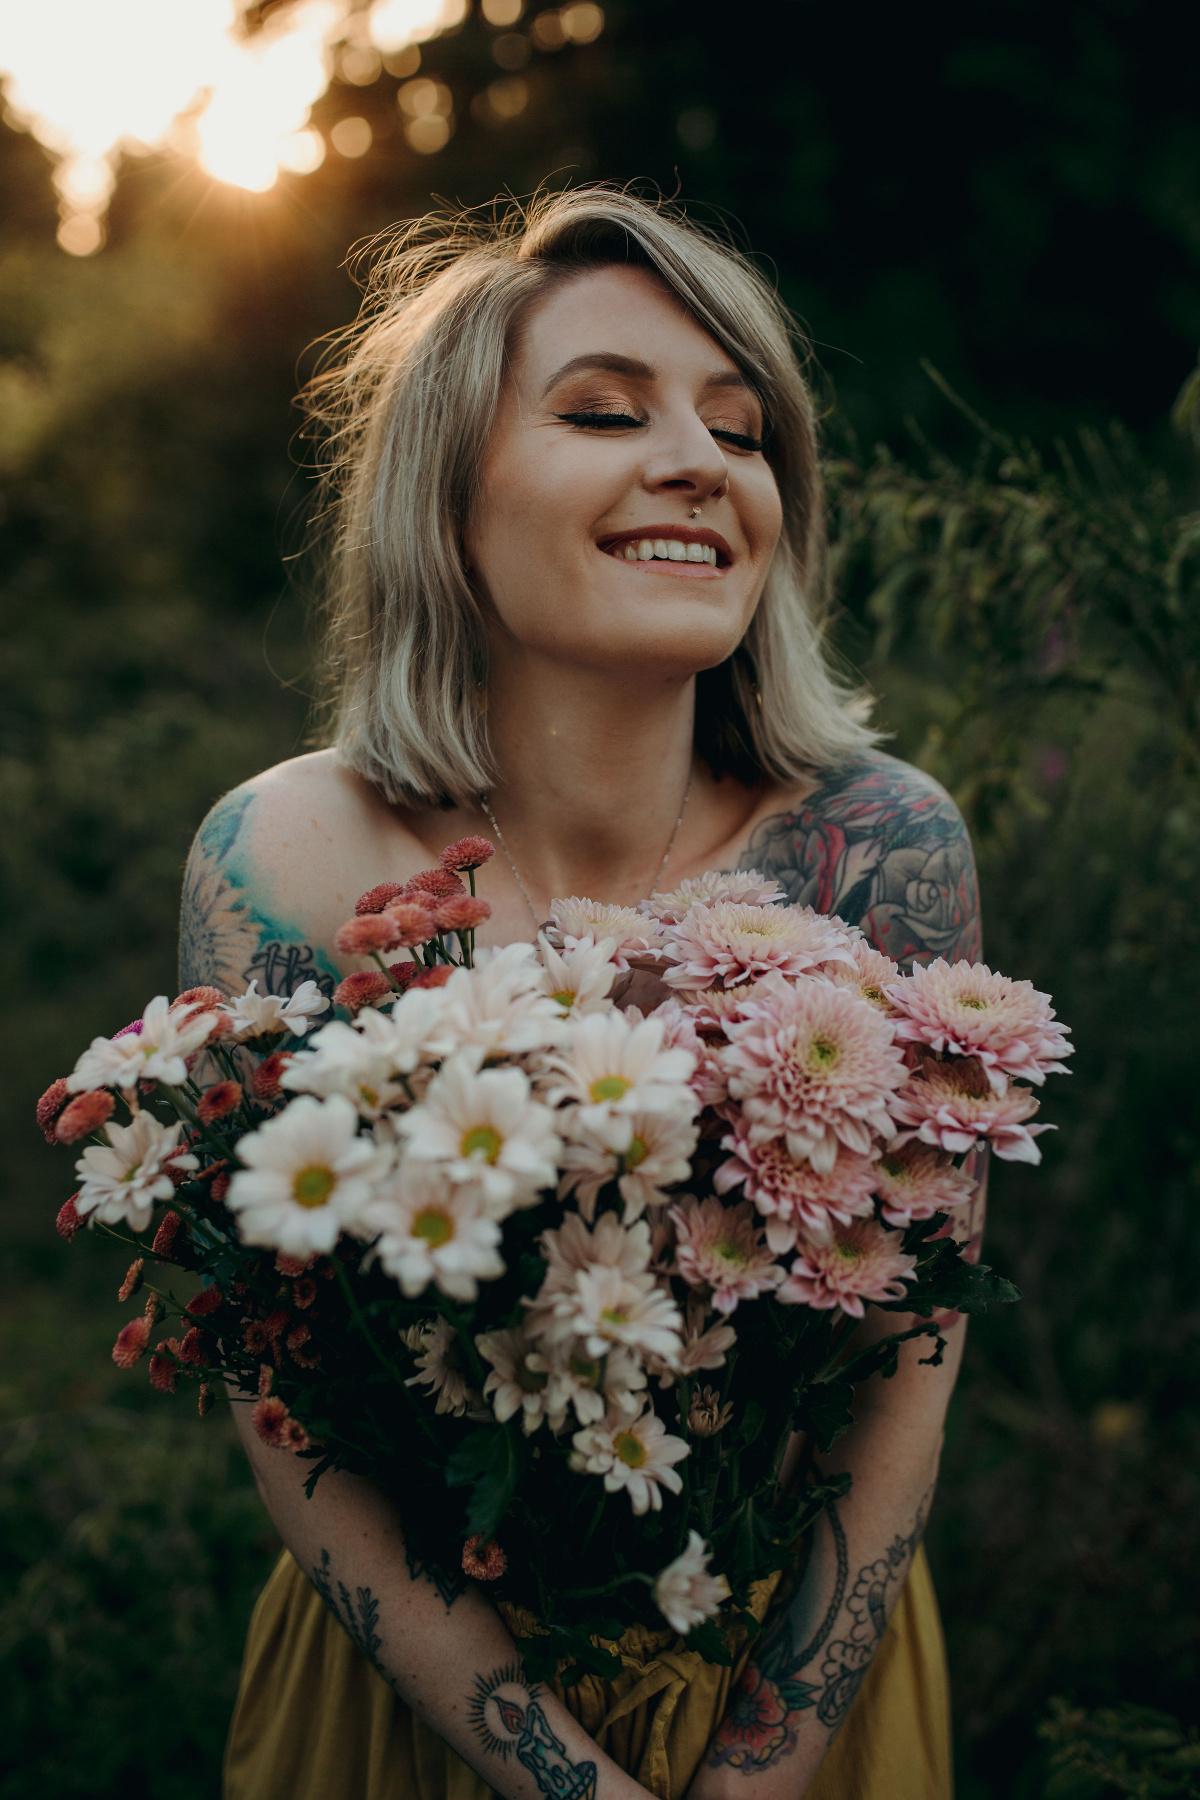 Jess Madsen holding a bouquet of flowers